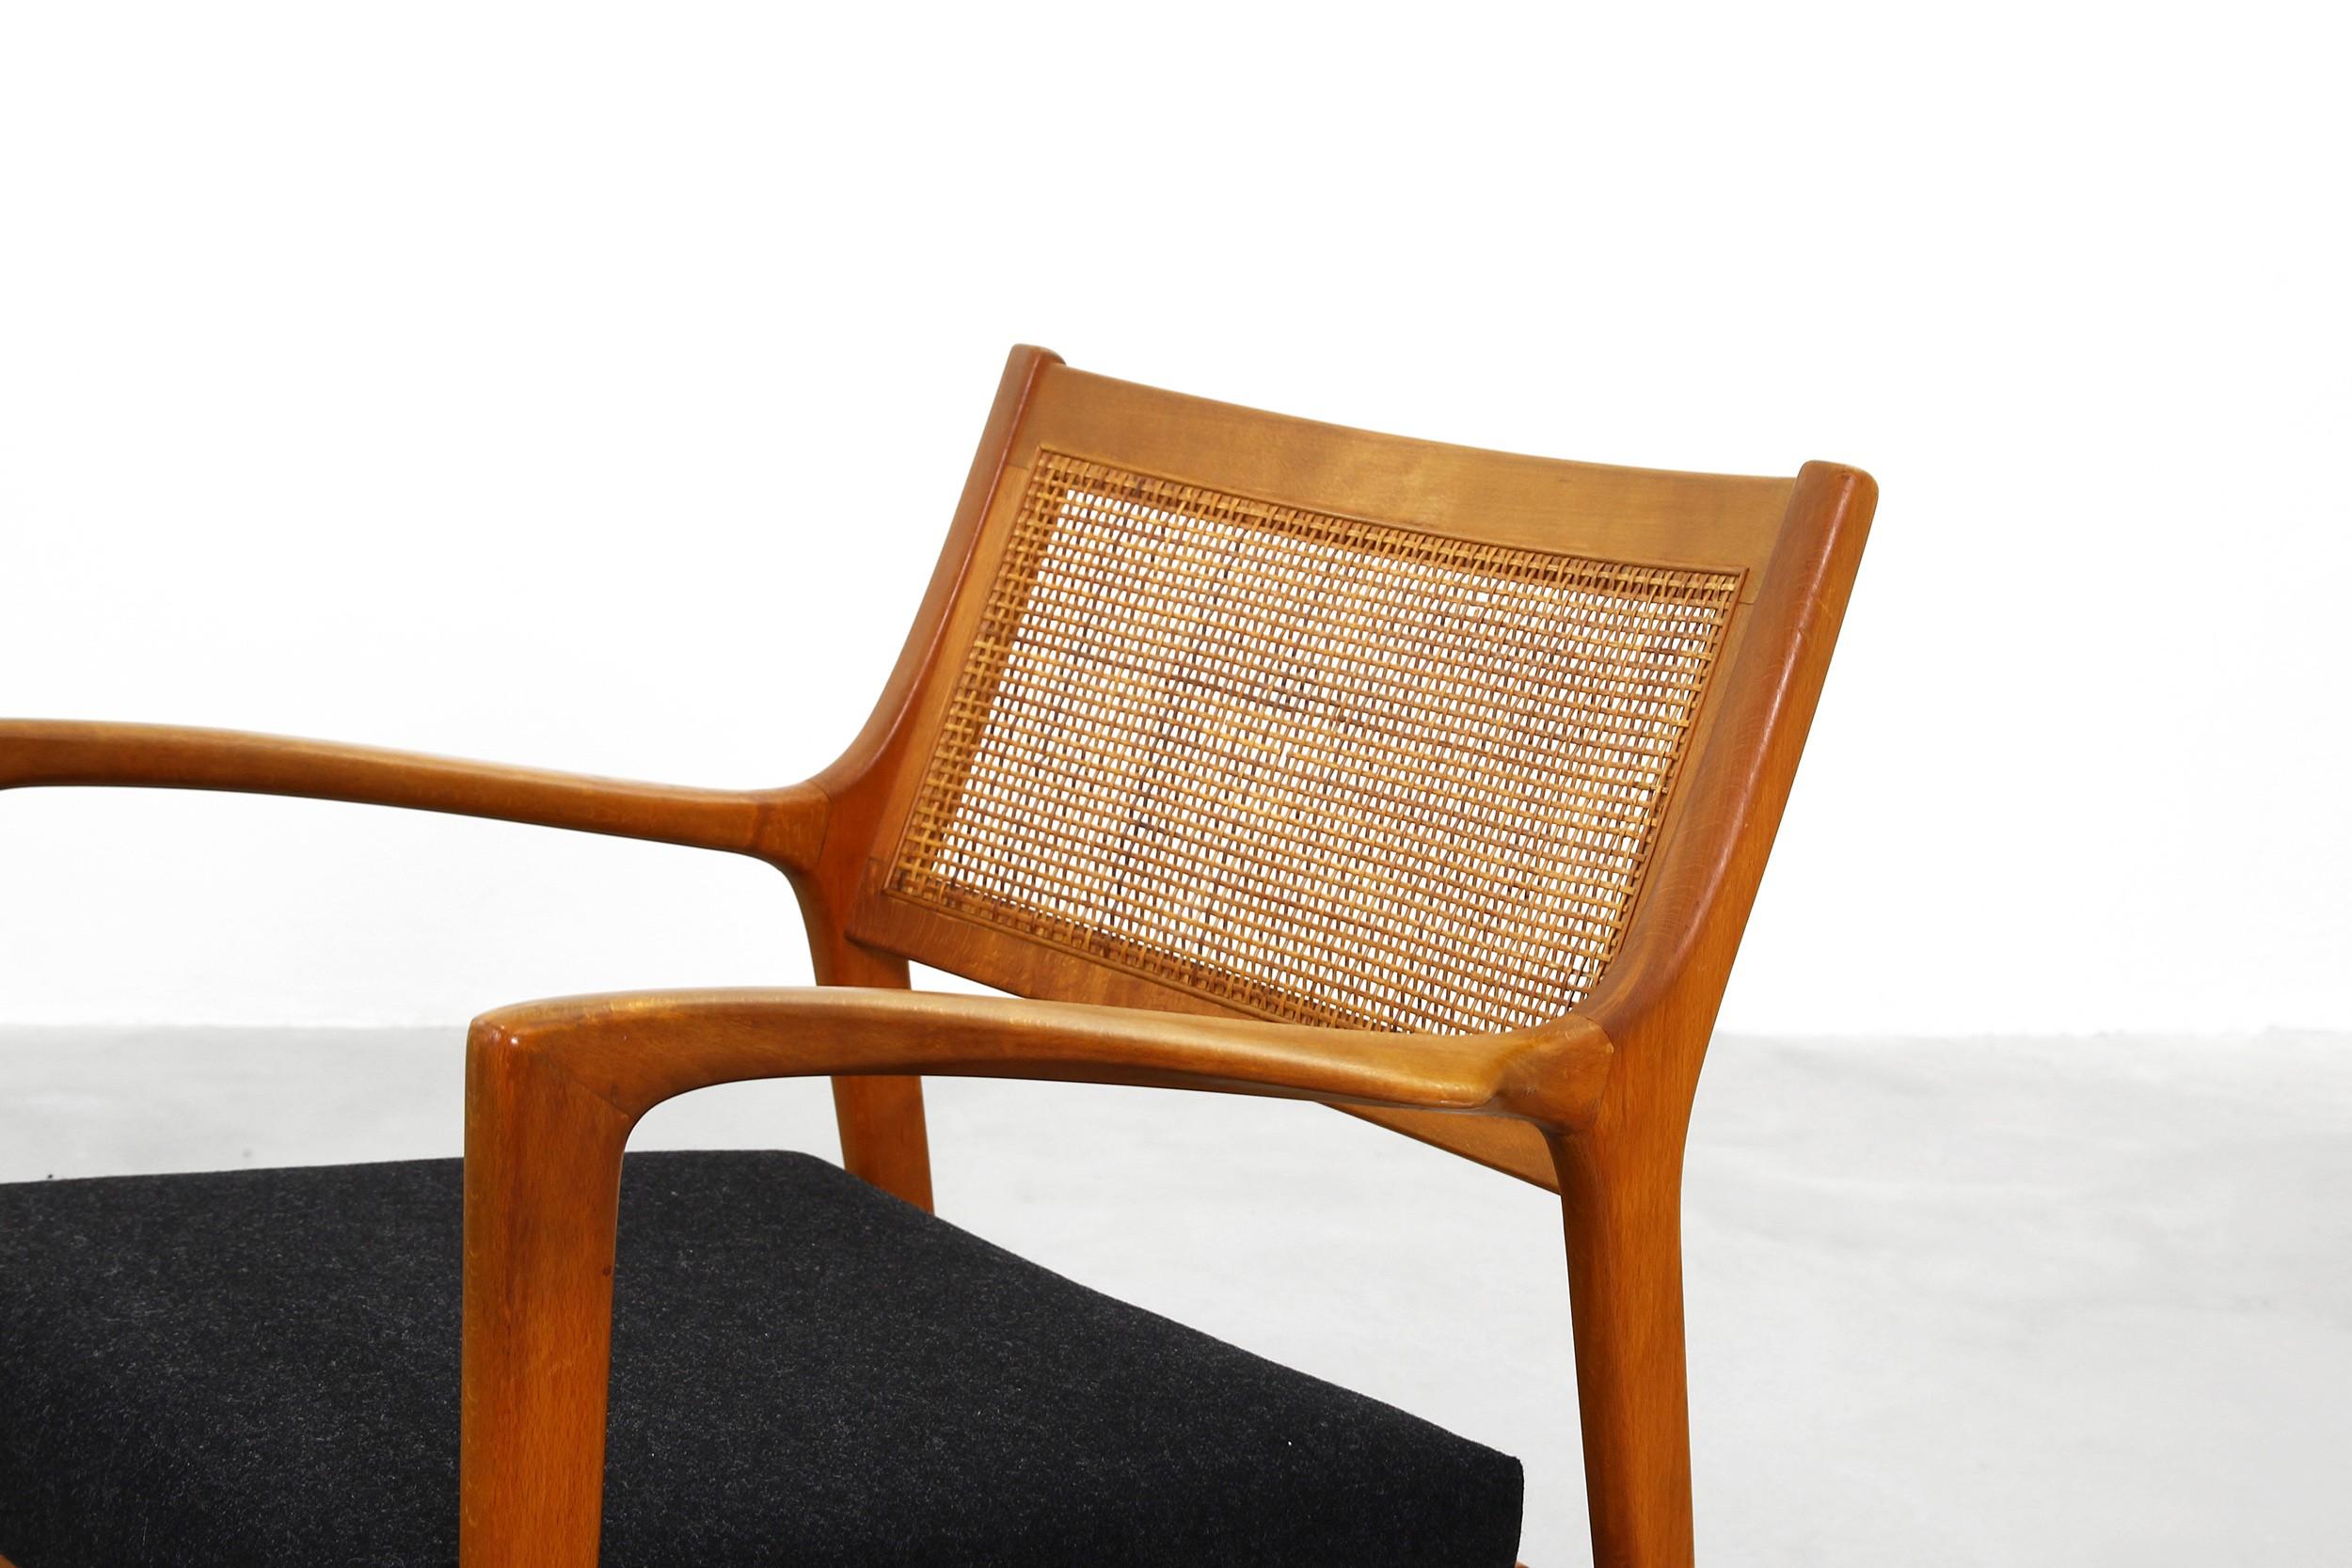 JOC Mobler Pair of F139 lounge chairs, Karl Erik Ekselius - 1960s ...